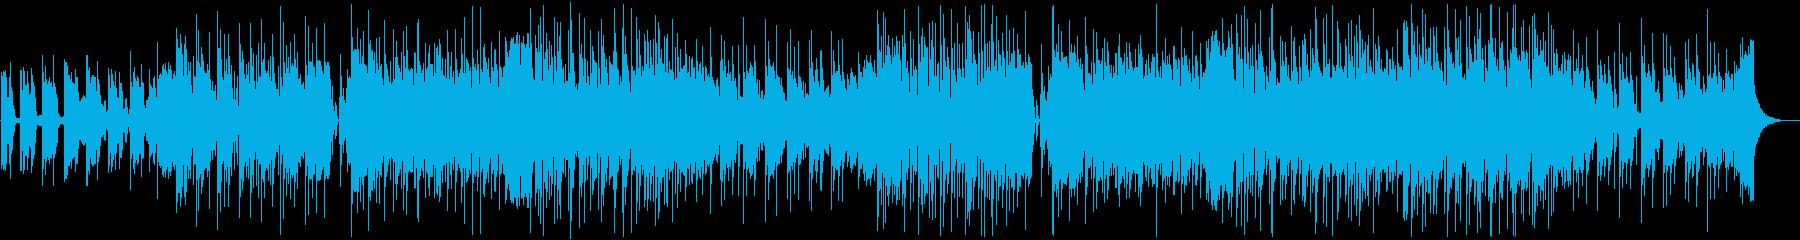 EDM系 マシュメロぽいポップな曲 -1の再生済みの波形